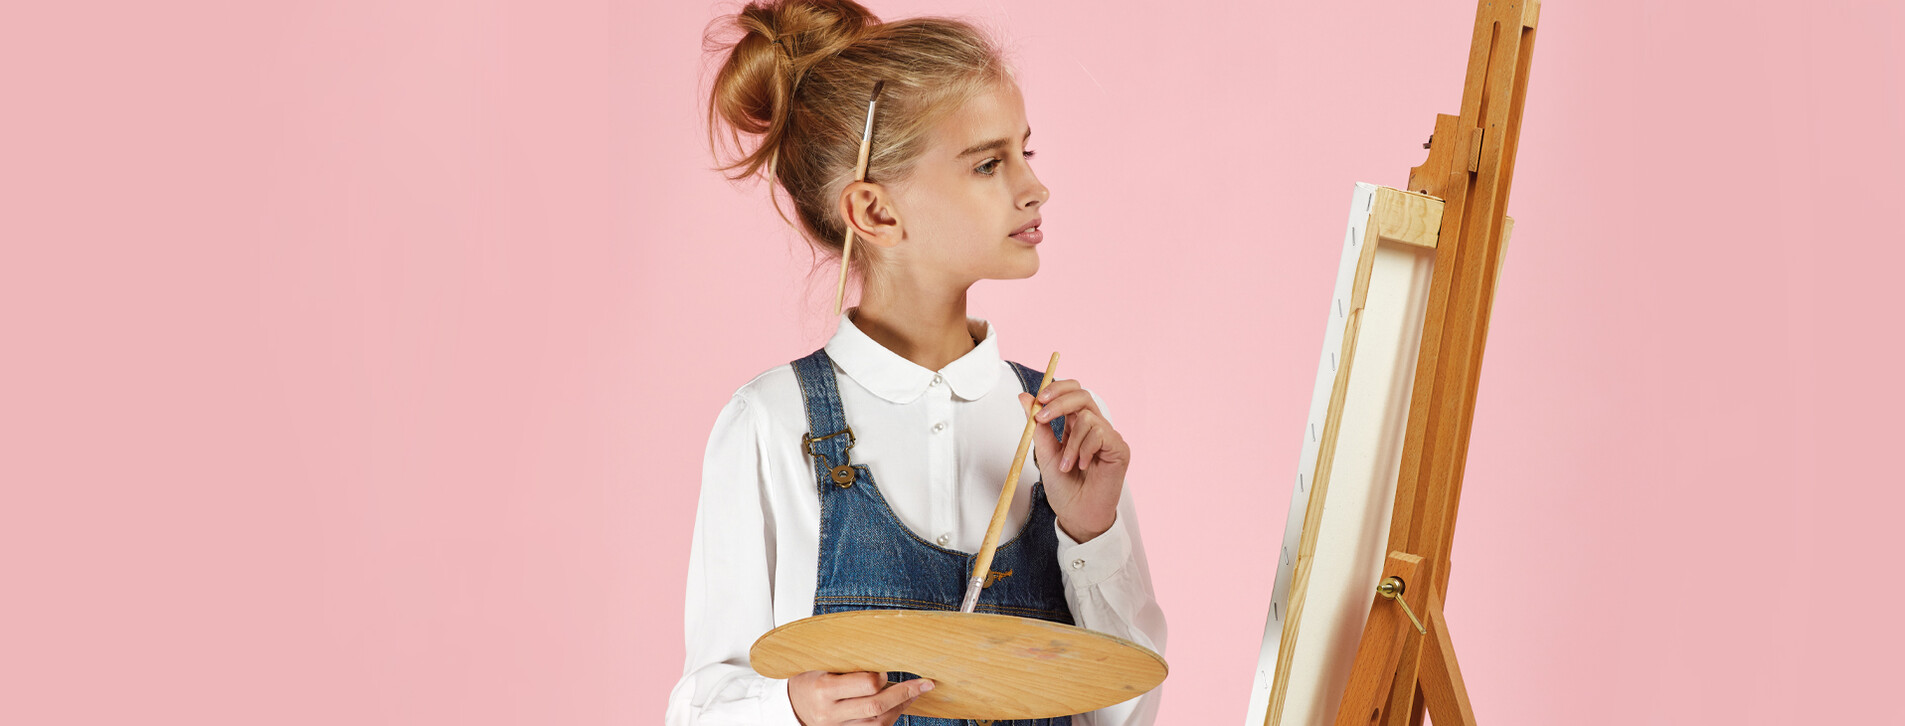 Фото 1 - Детский мастер-класс живописи